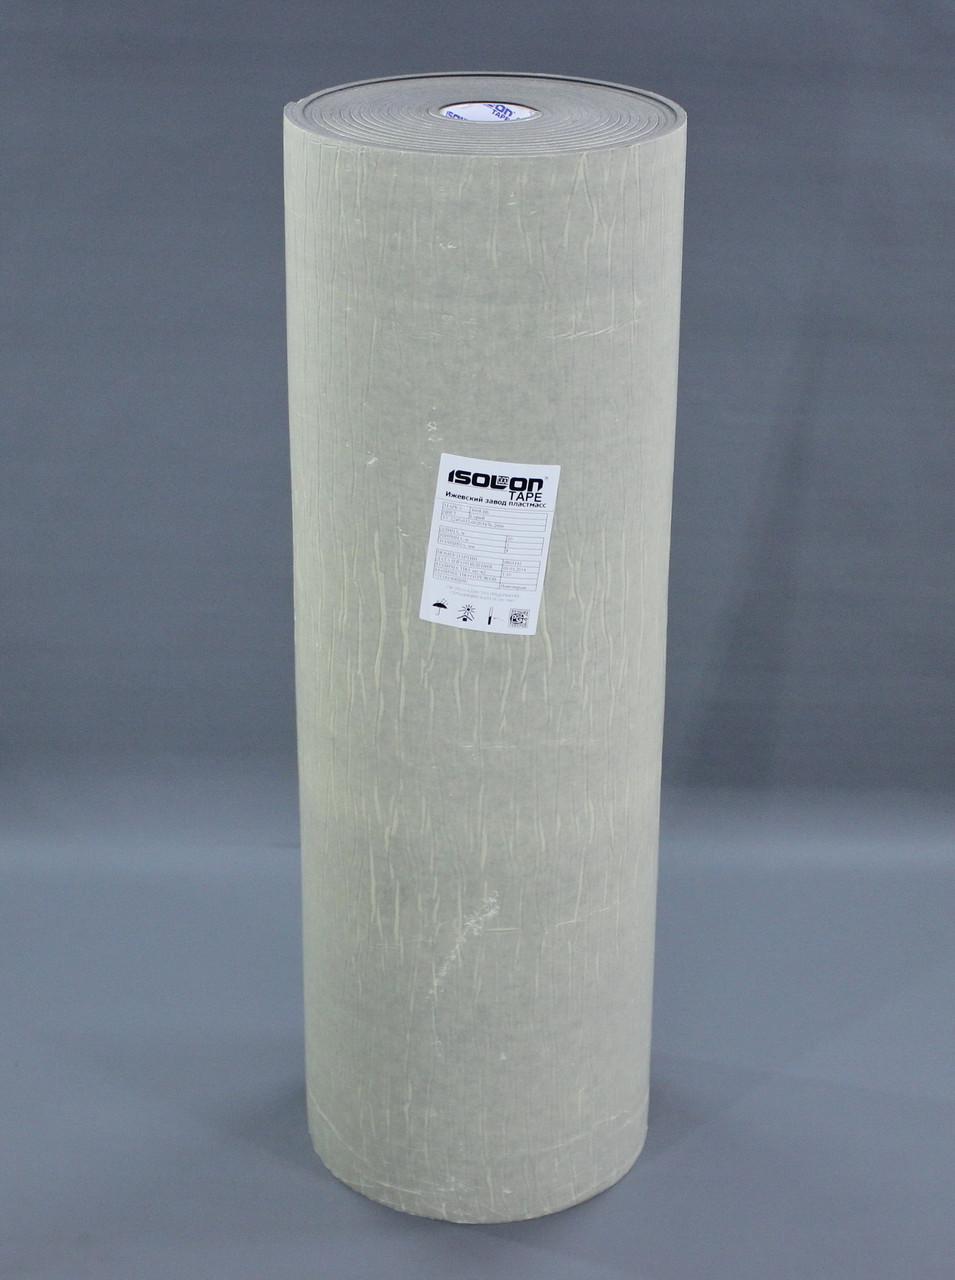 Isolontape 500 3008 самоклейка 8 мм